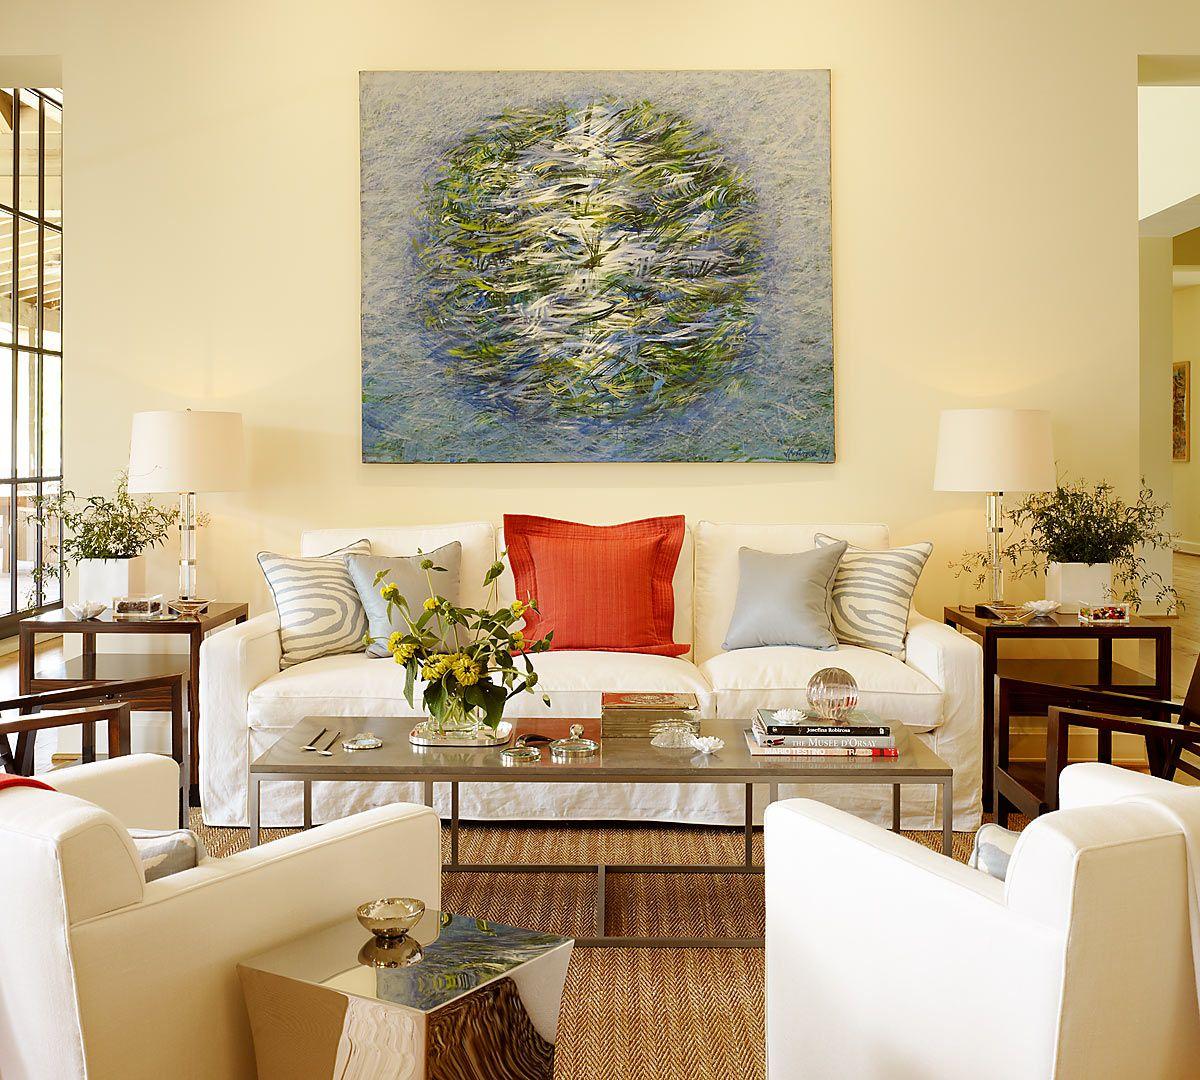 Santa lucia preserve bamo top interior designers design usa portfolios also in home decor rh pinterest